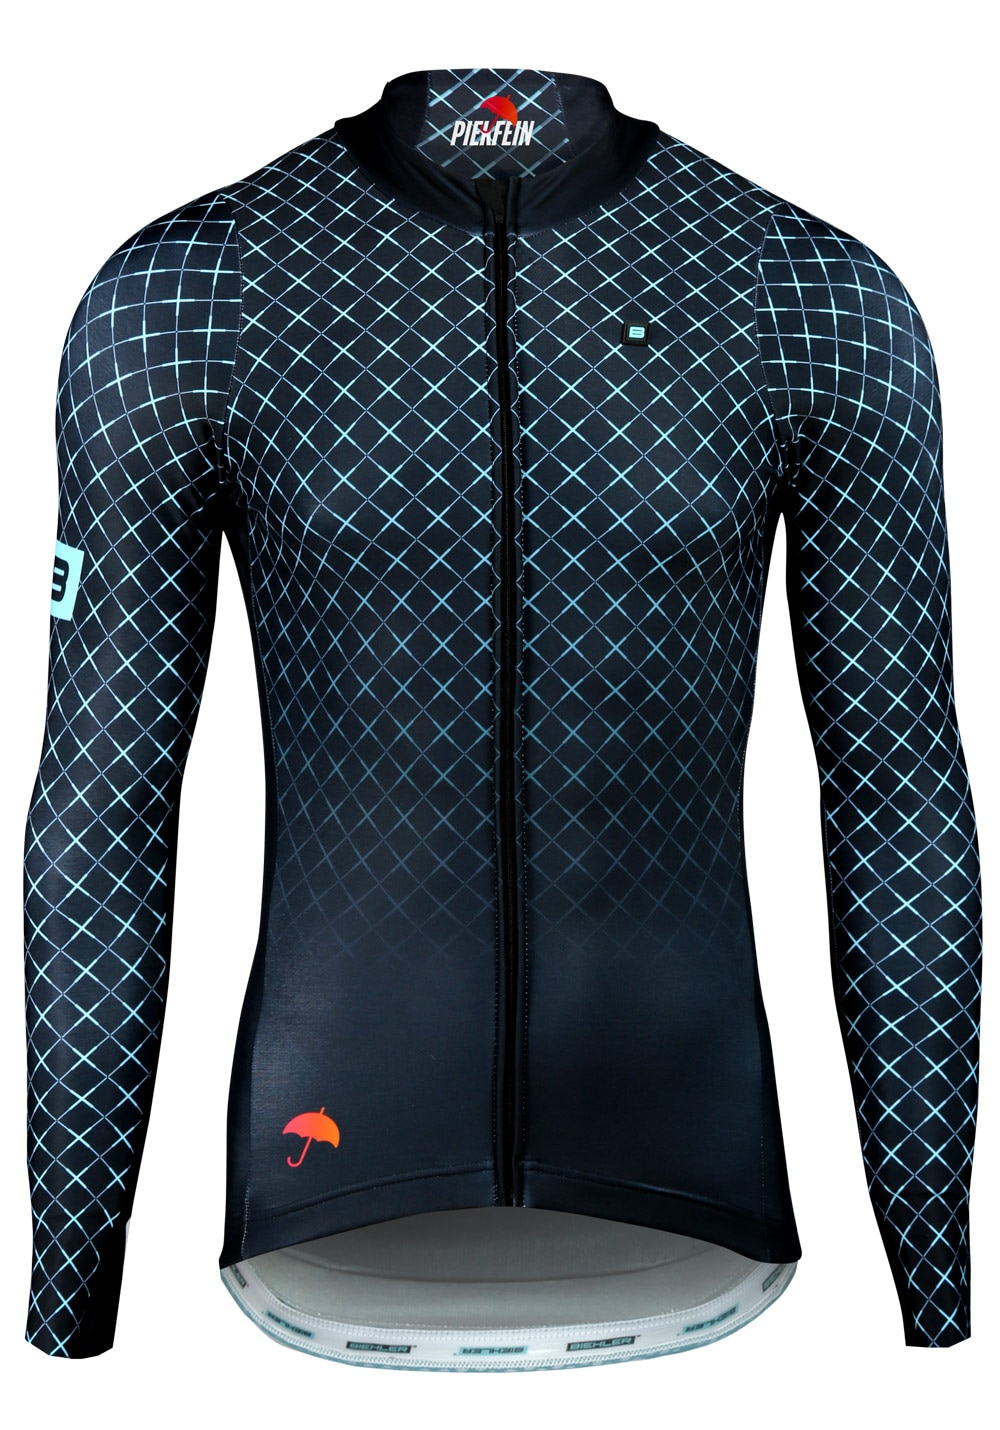 2019, equipo profesional de invierno pimme, conjunto de Jersey de Ciclismo de manga larga, Ropa de bicicleta MTB, uniforme, Polar térmico, Maillot de bicicleta, Ropa de Ciclismo